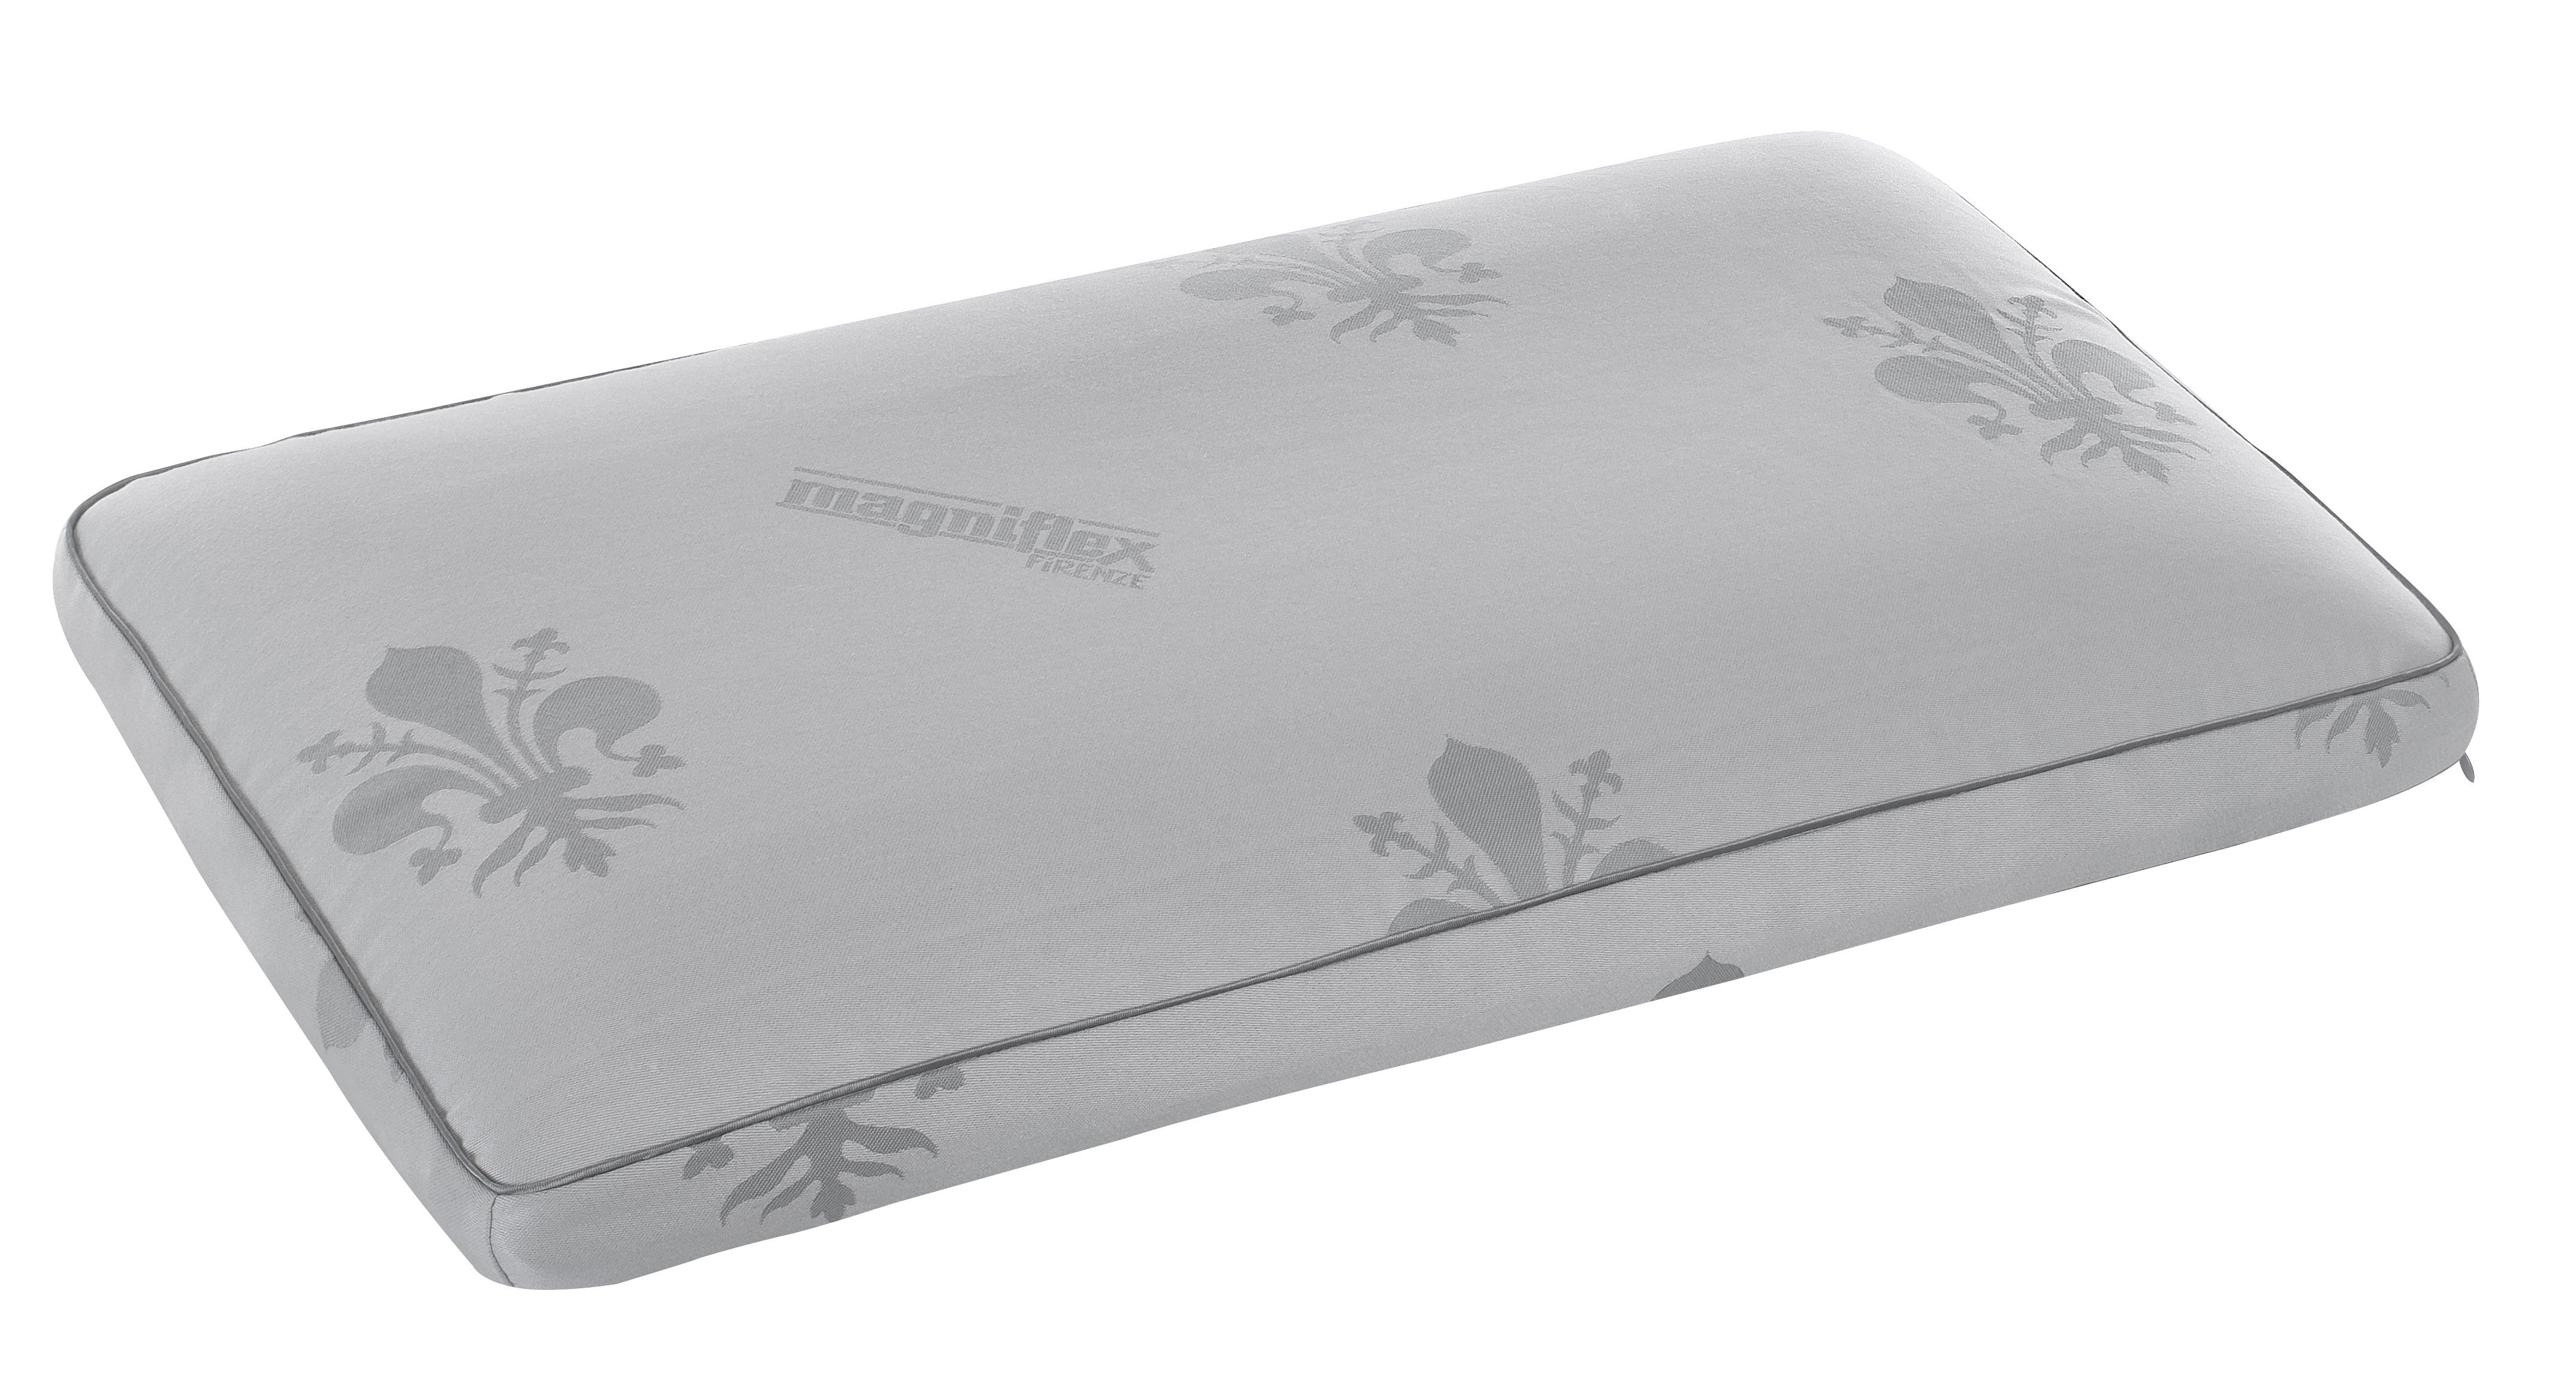 Подушка Magniflex Virtuoso Mallow Standard